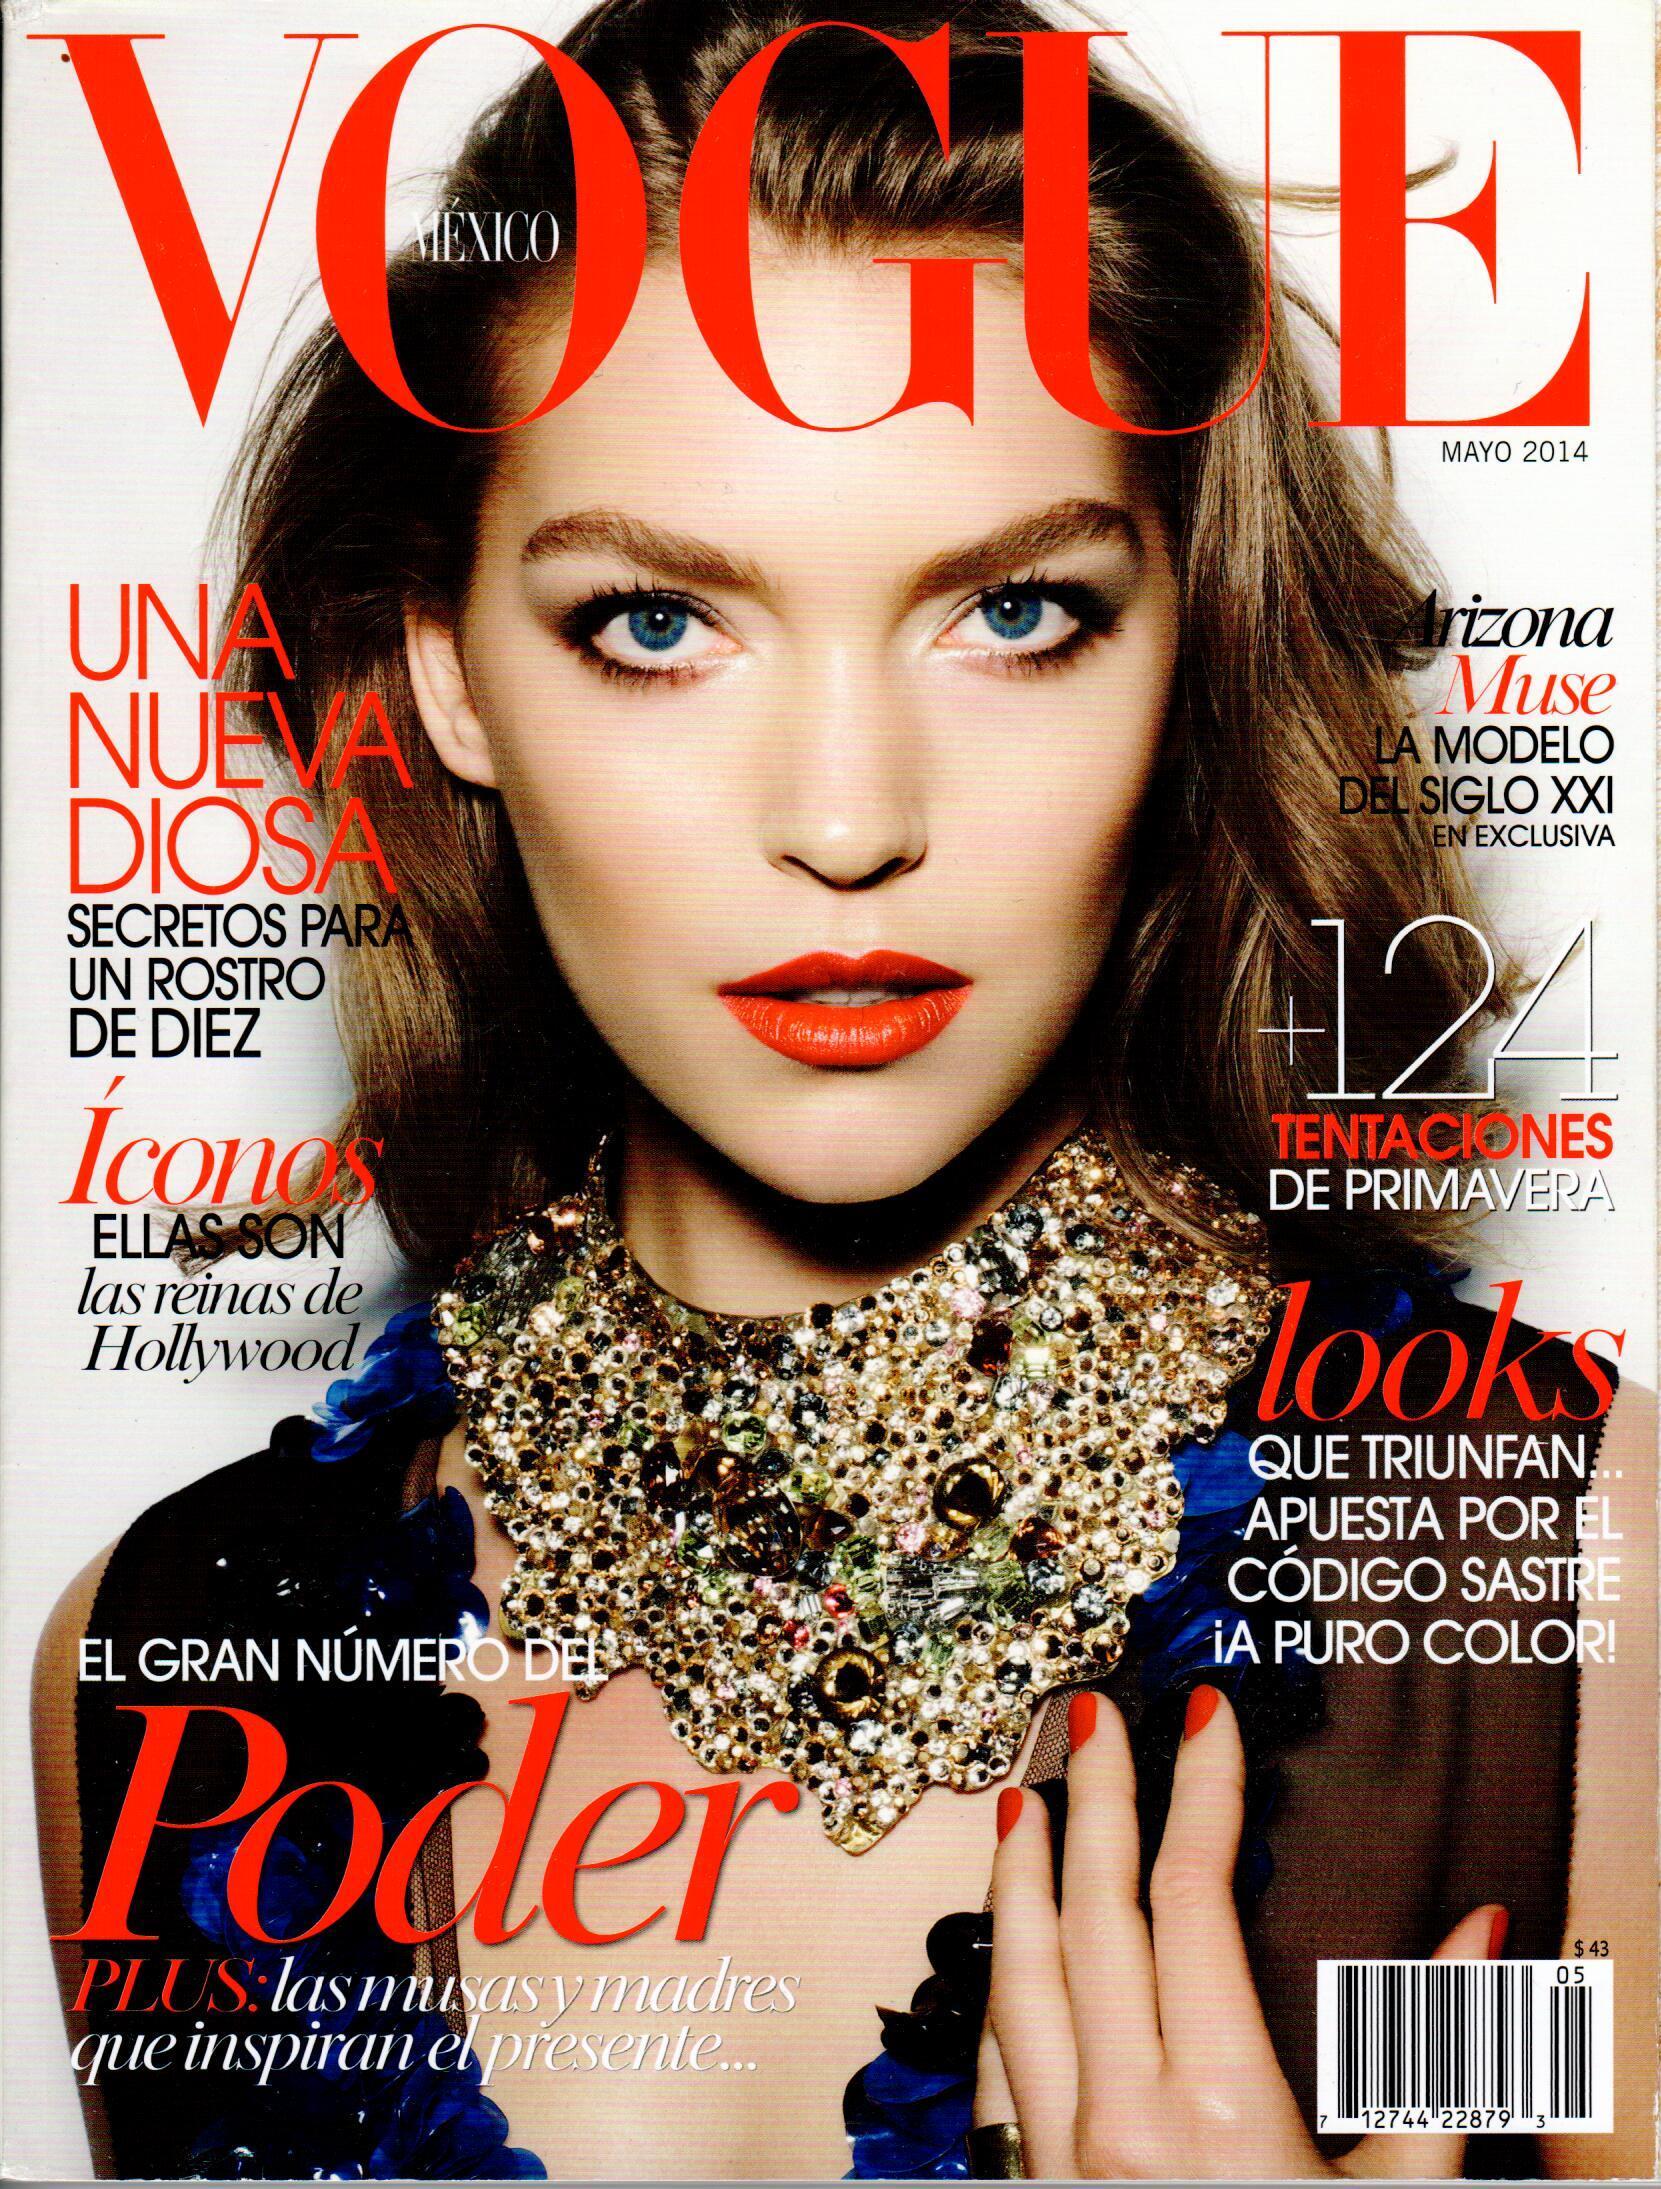 Vogue Mexico cover thumbnail